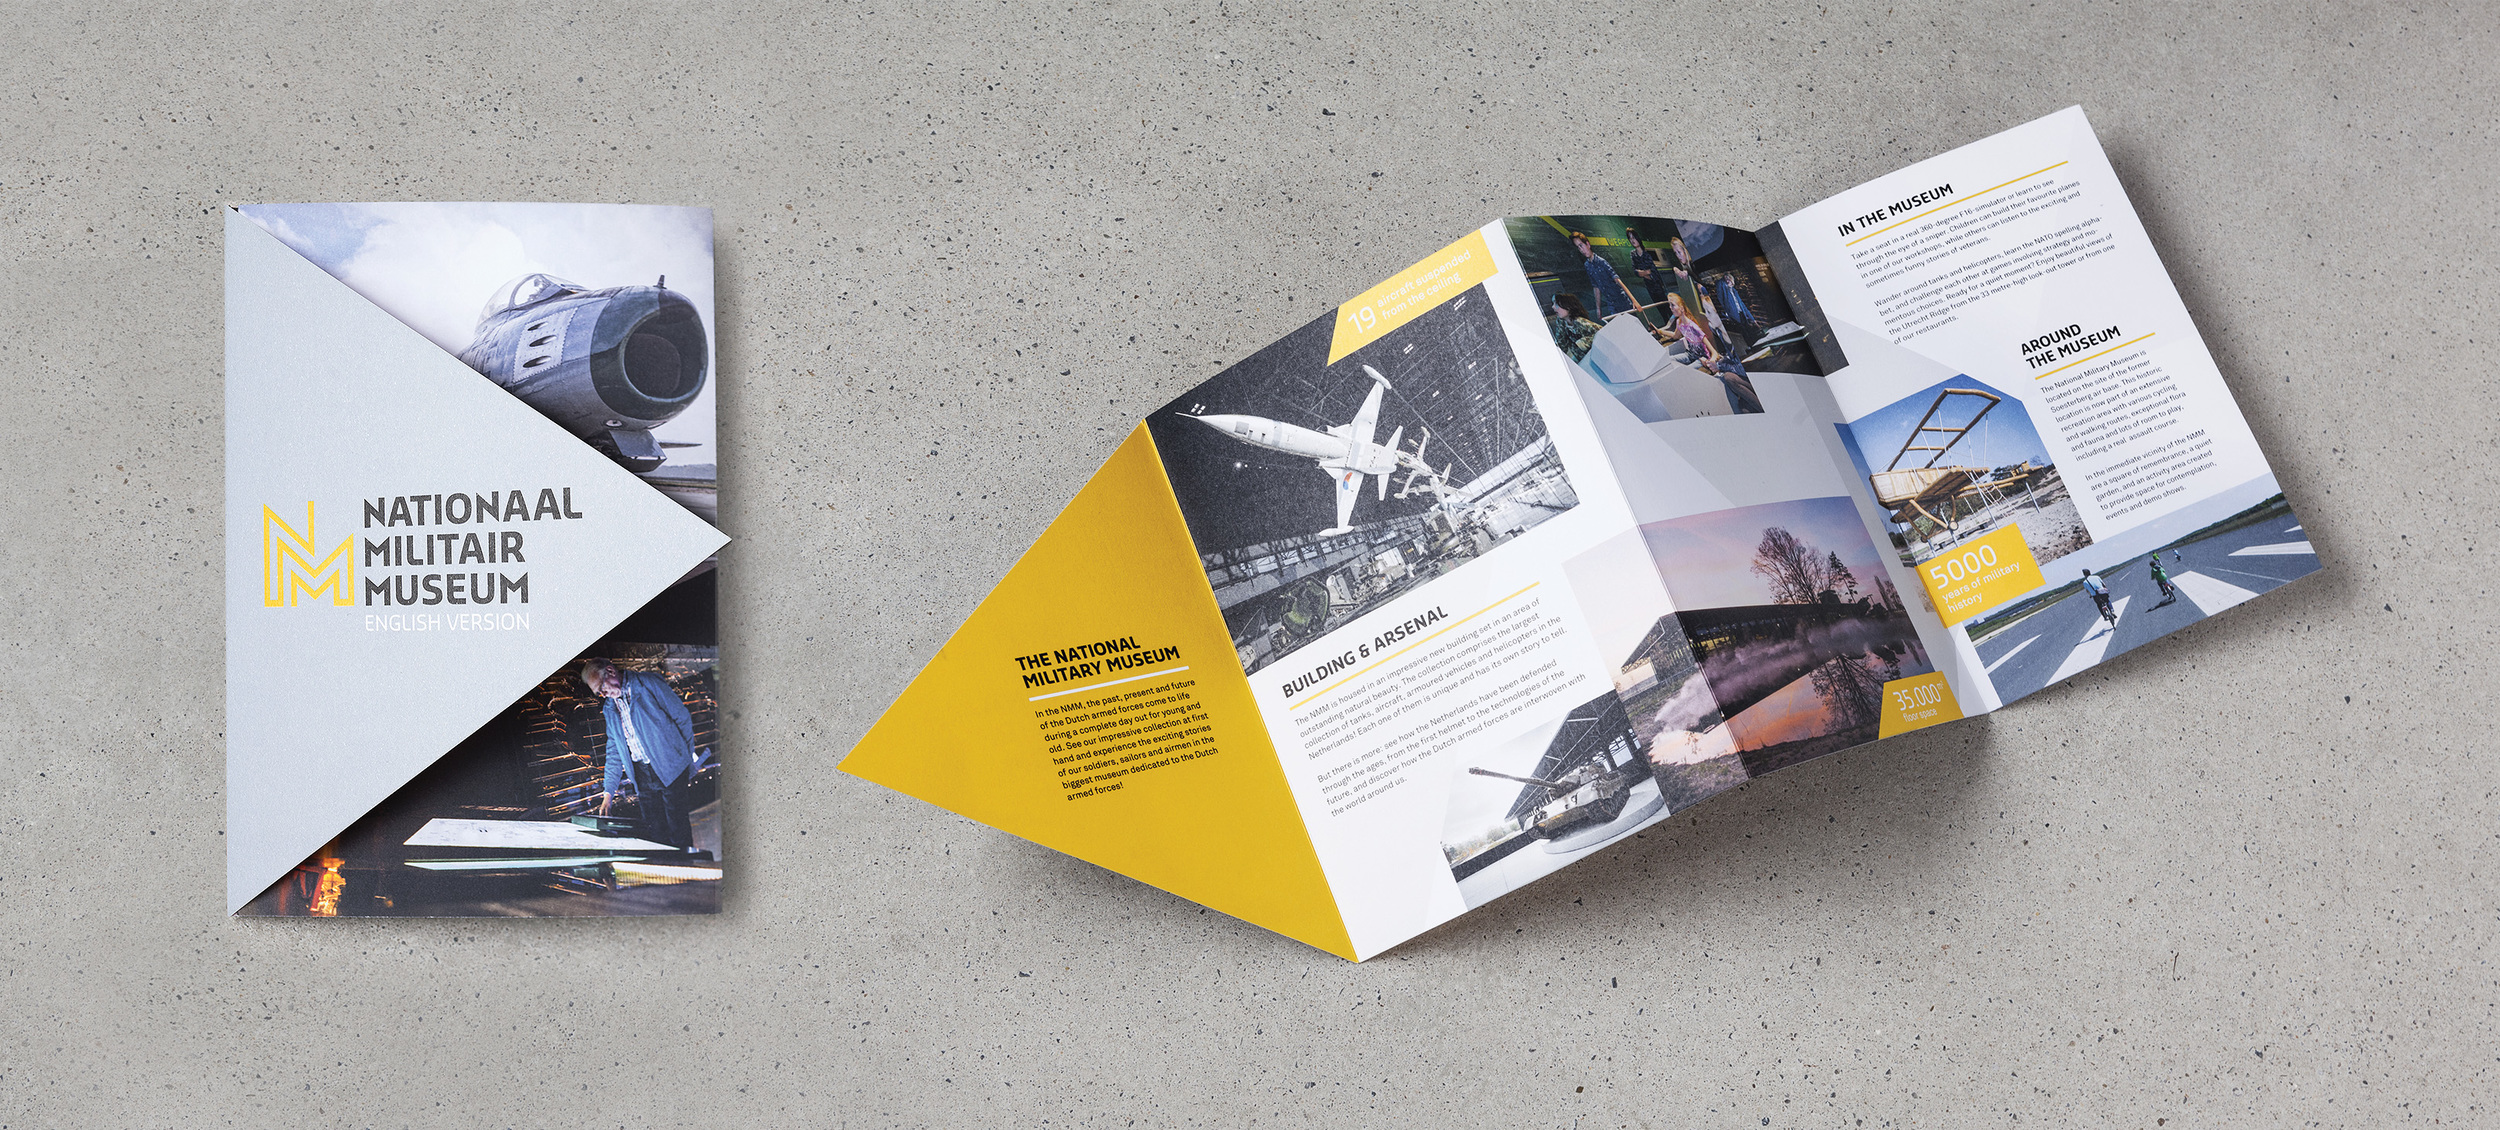 03A-Middelen-folder.png